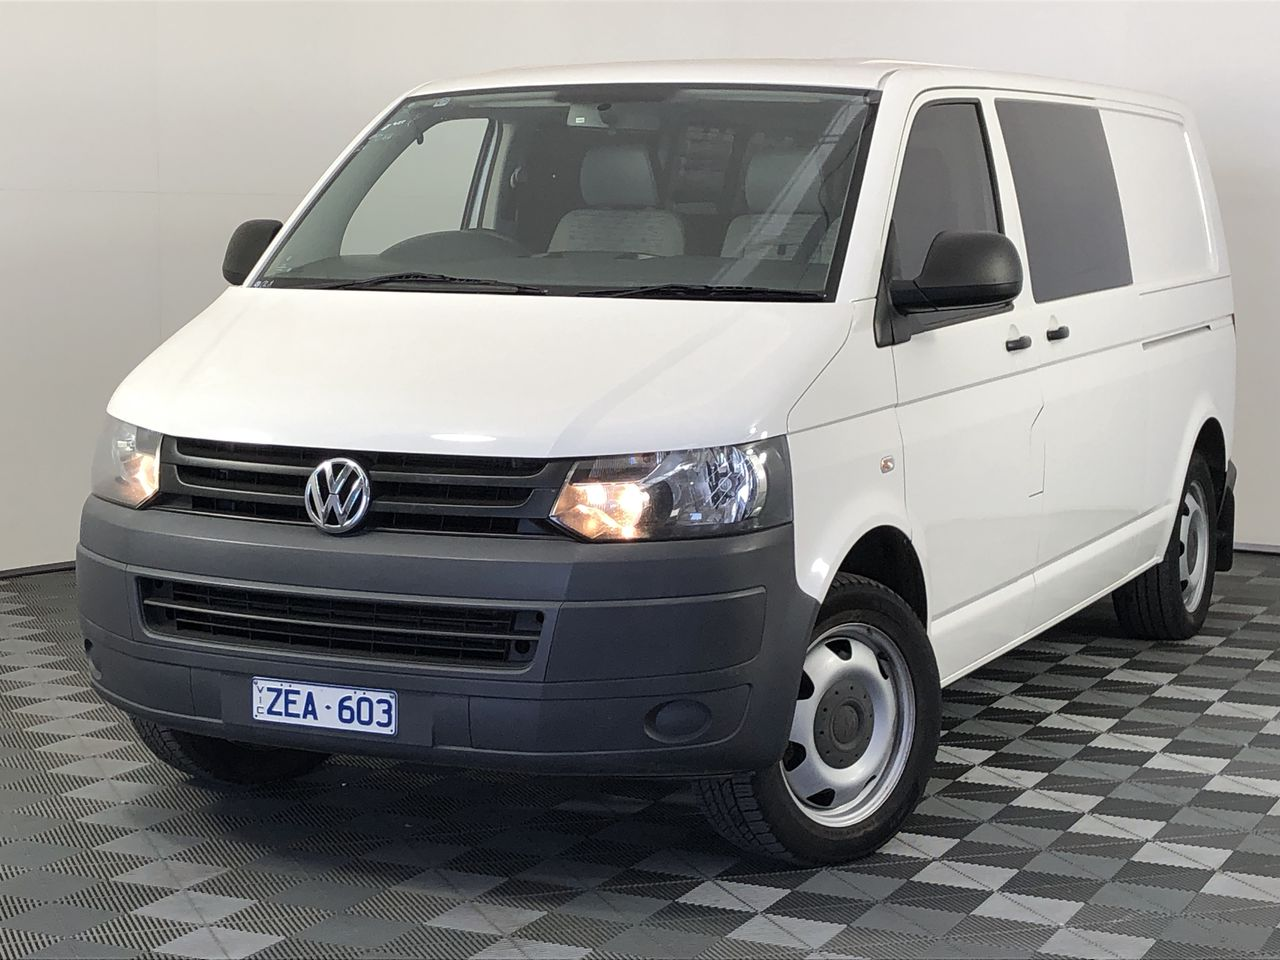 2012 Volkswagen Transporter TDI400 LWB T5 Turbo Diesel Automatic Van